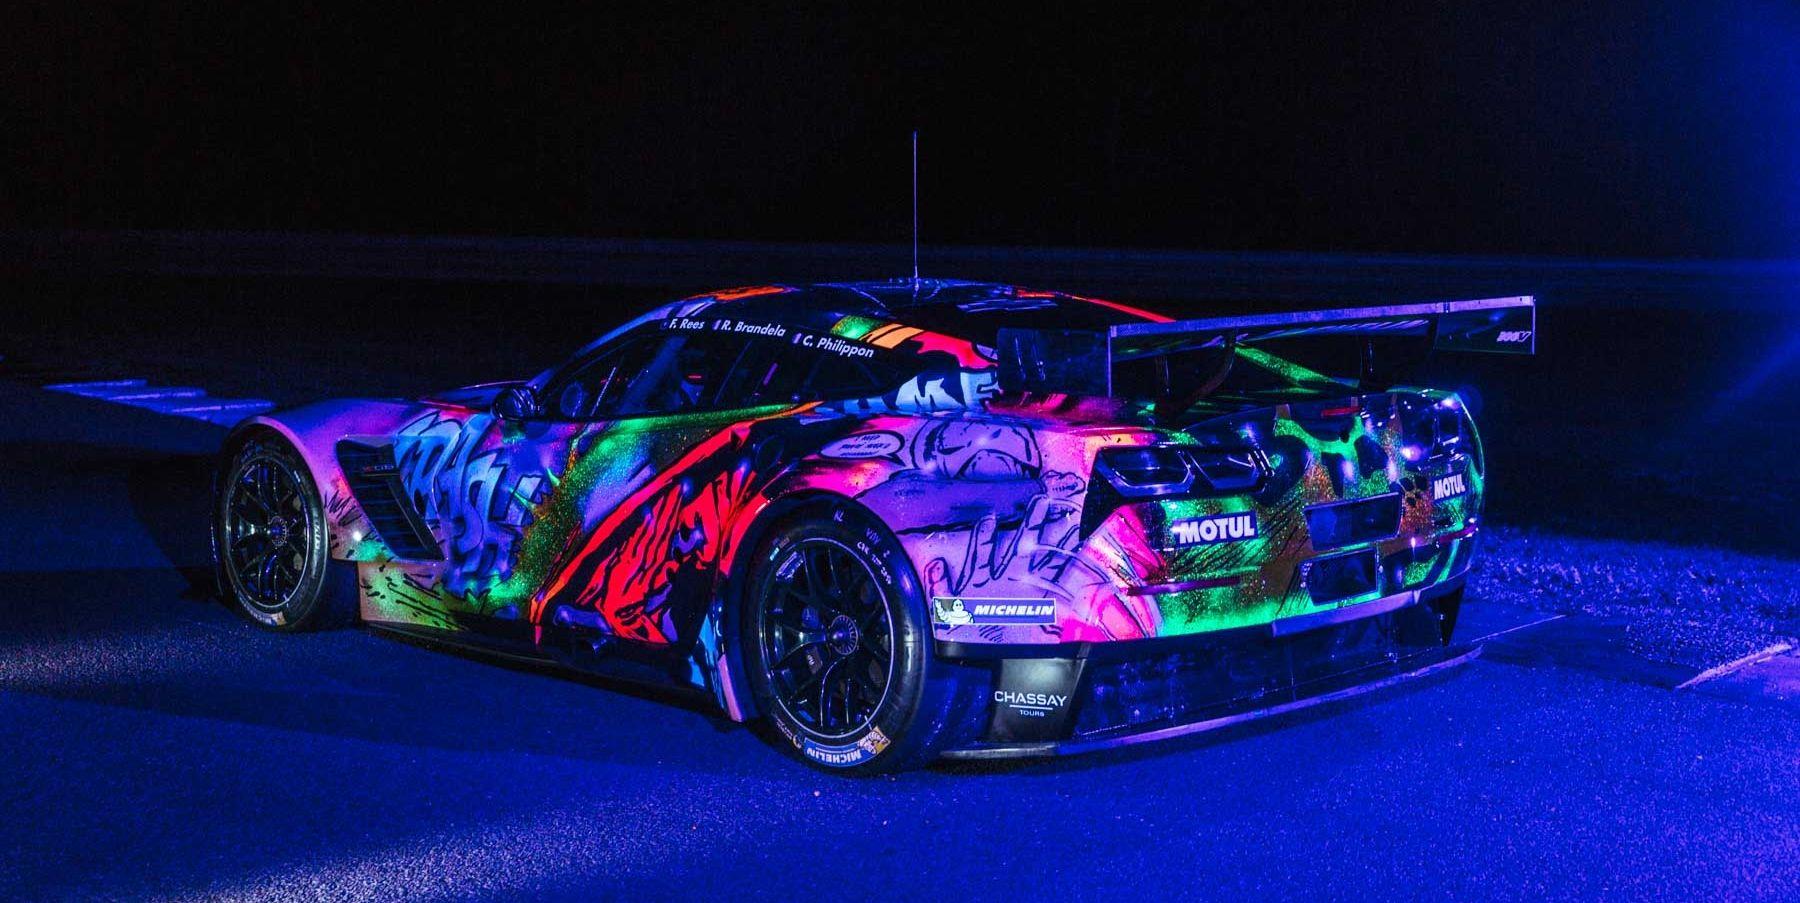 Glow-in-the-dark Corvette C7.R